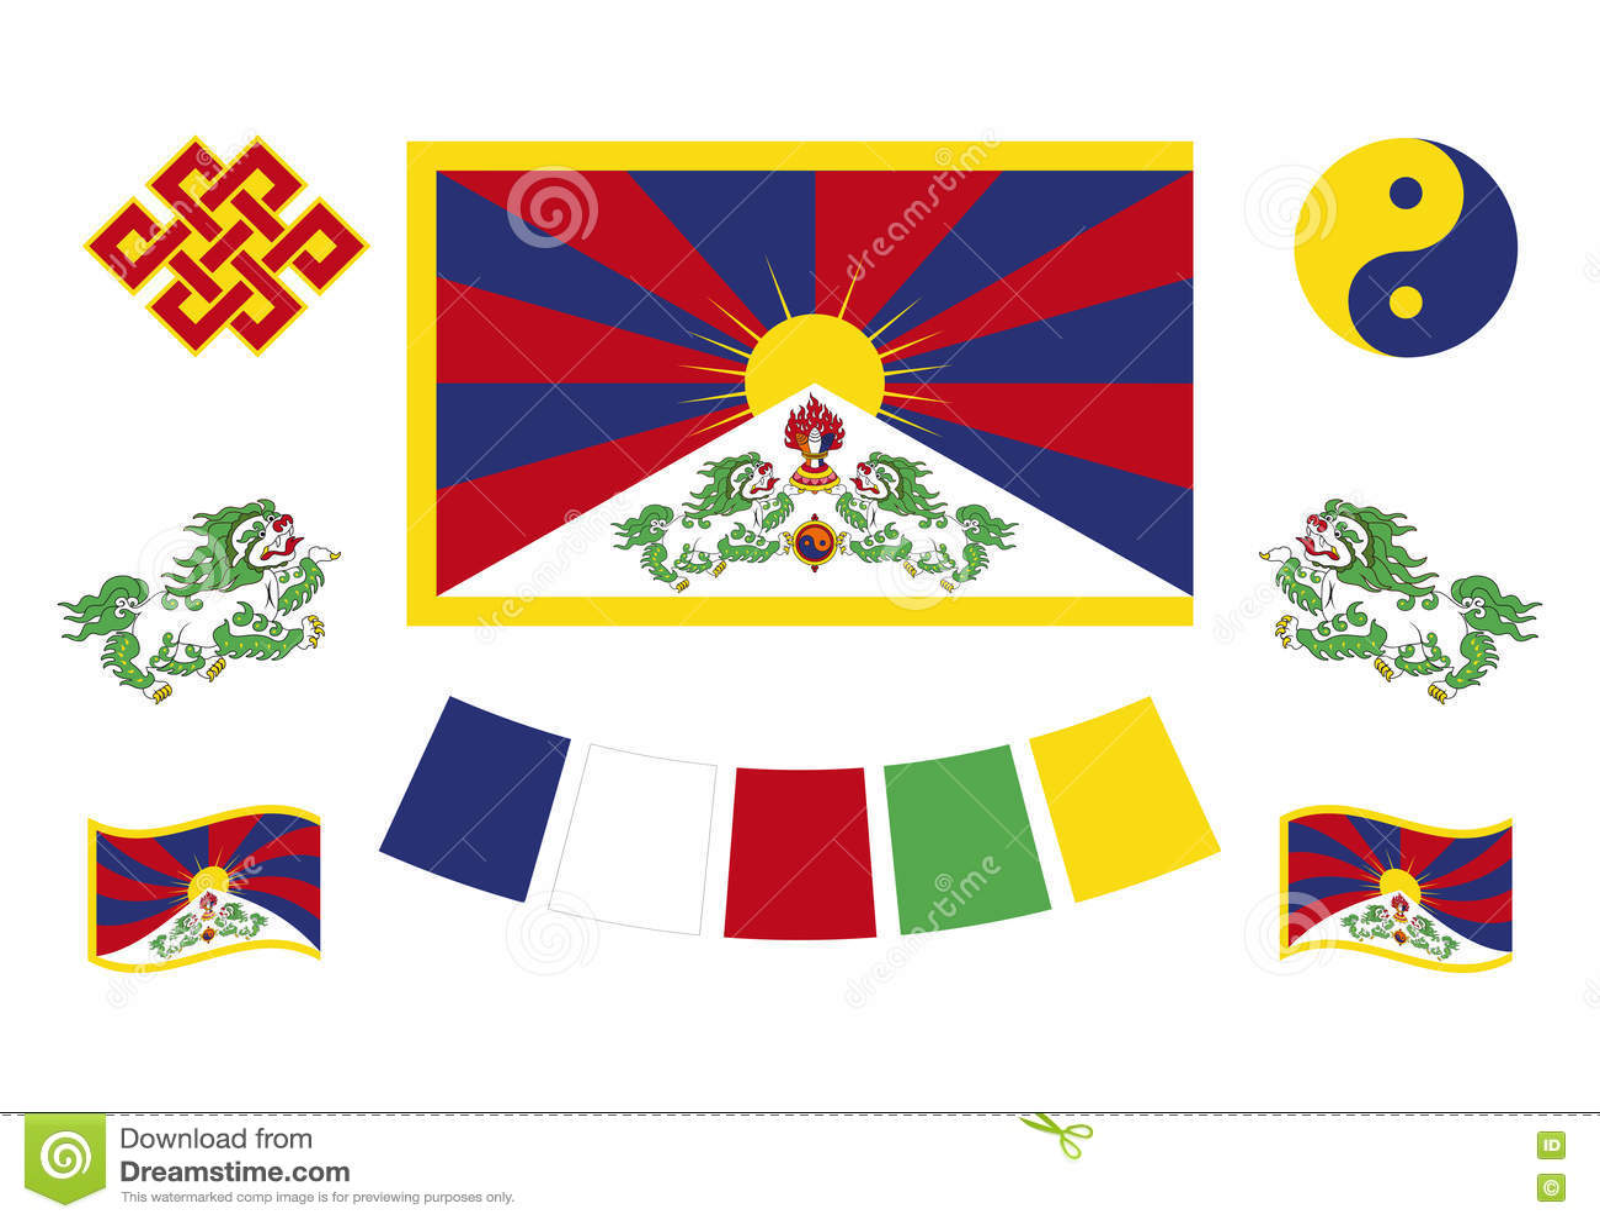 Tibetan Flag And Symbols Stock Vector Illustration Of Buddhism